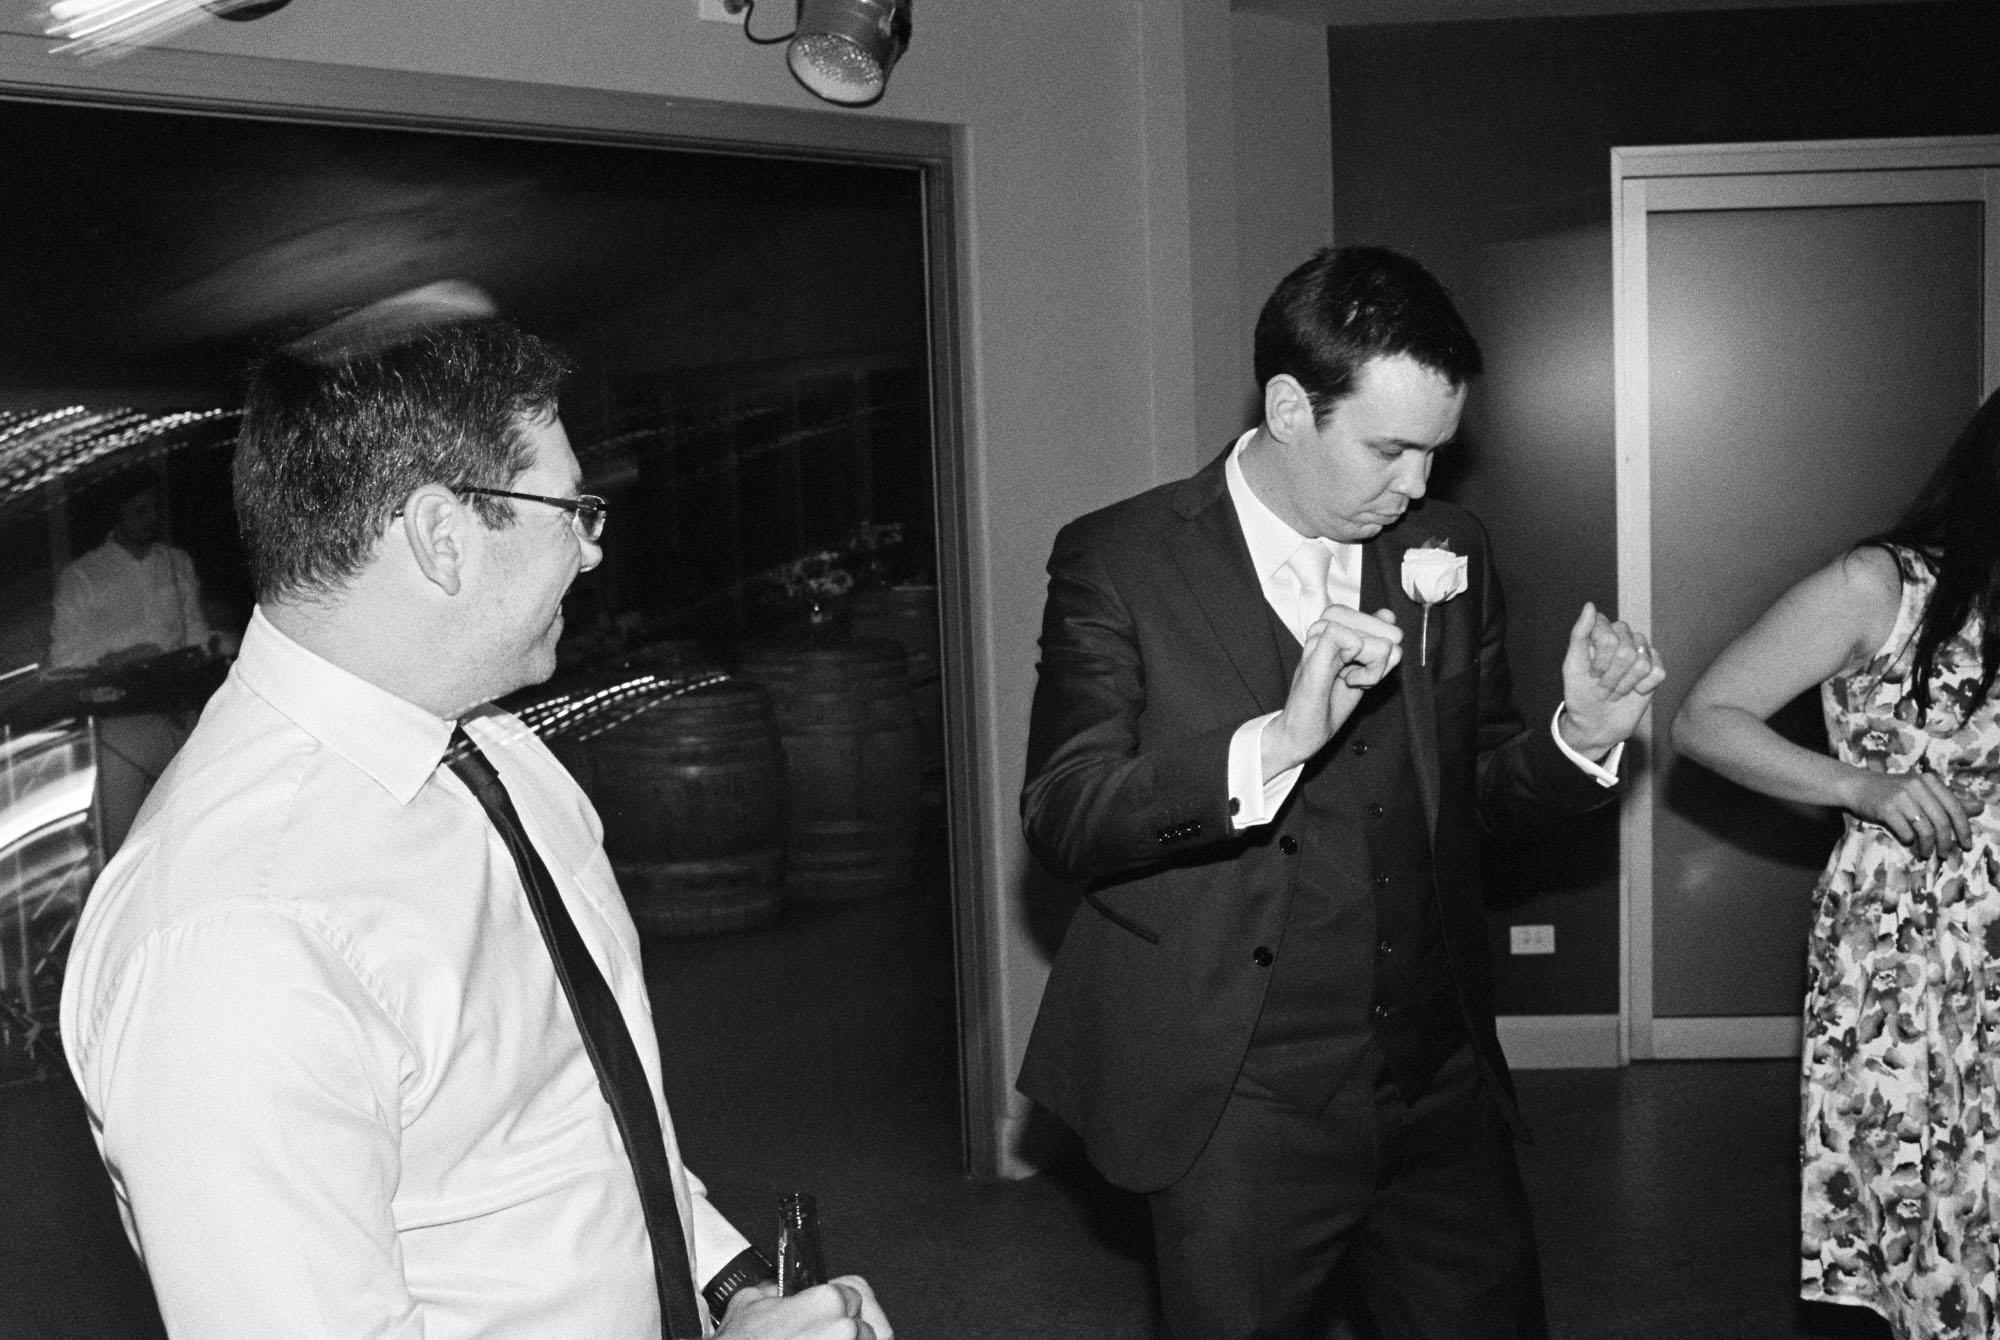 Glen-Ewin-Estate-wedding-photography-104.jpg